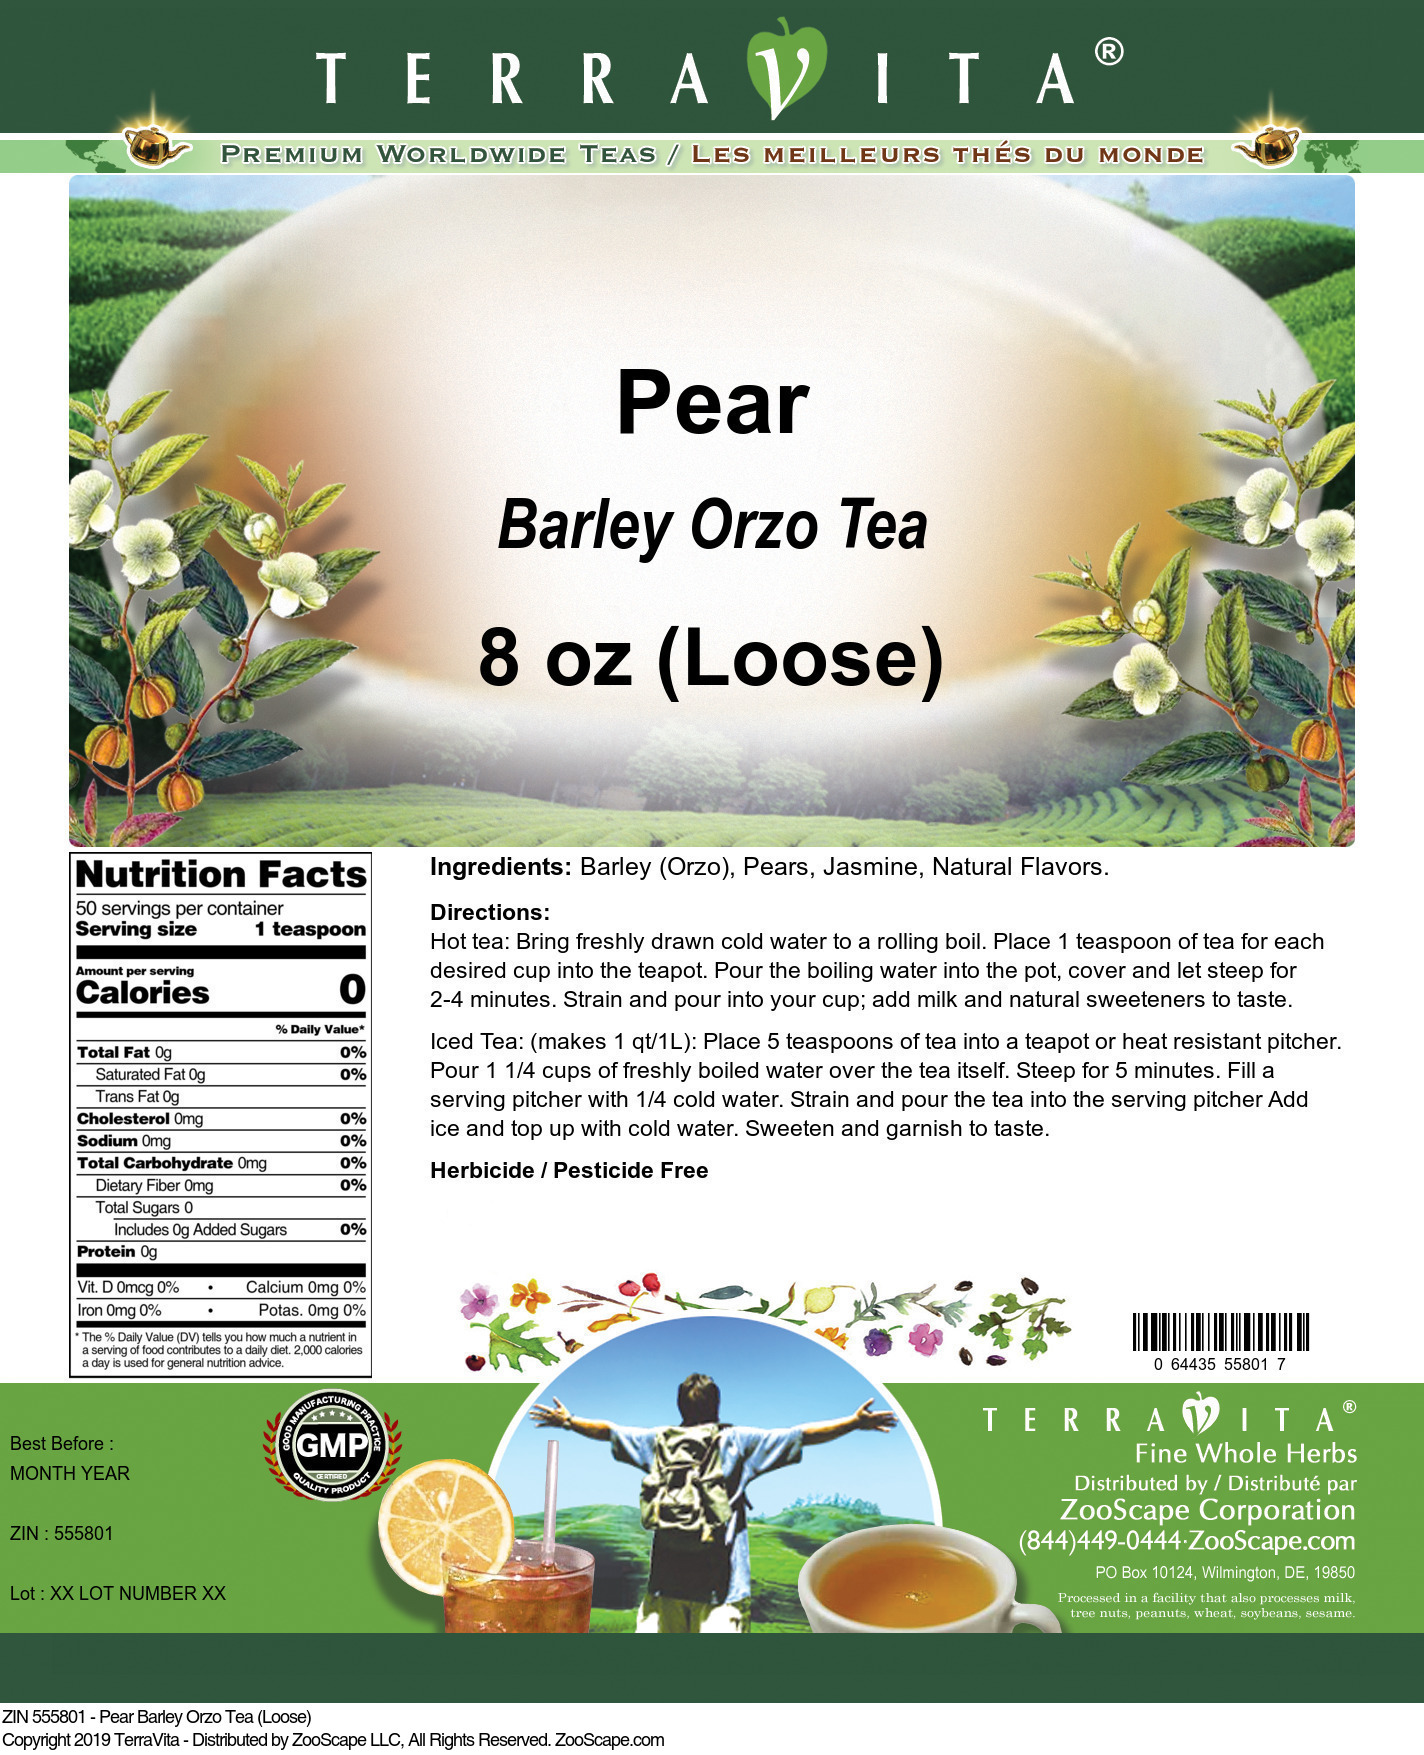 Pear Barley Orzo